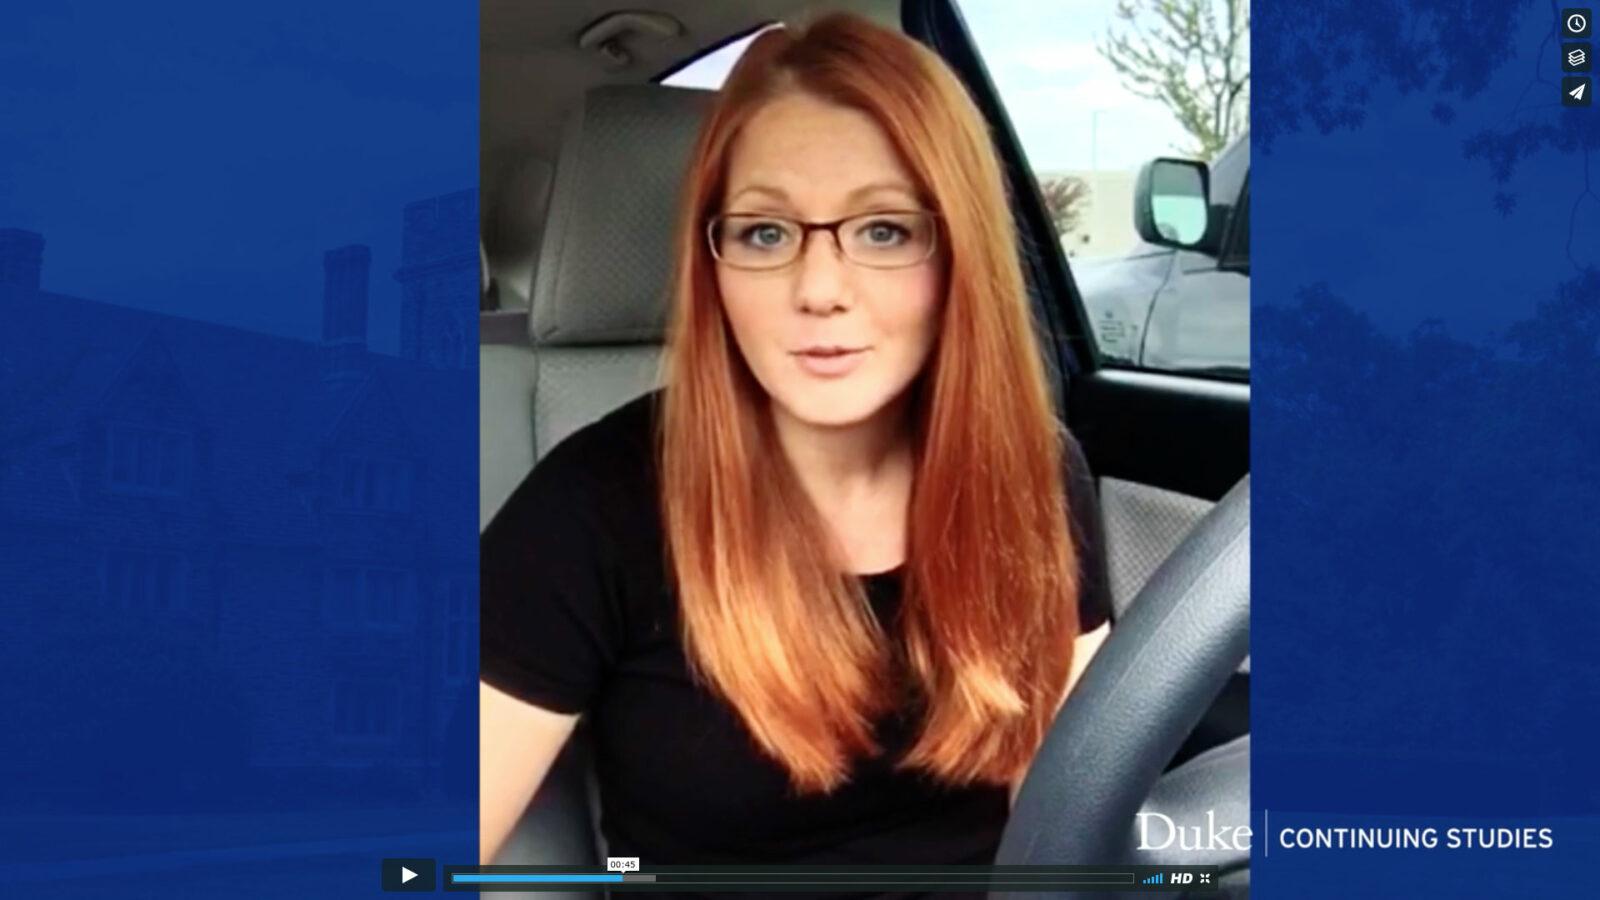 Simplilearn + Duke University Continuing Studies Video